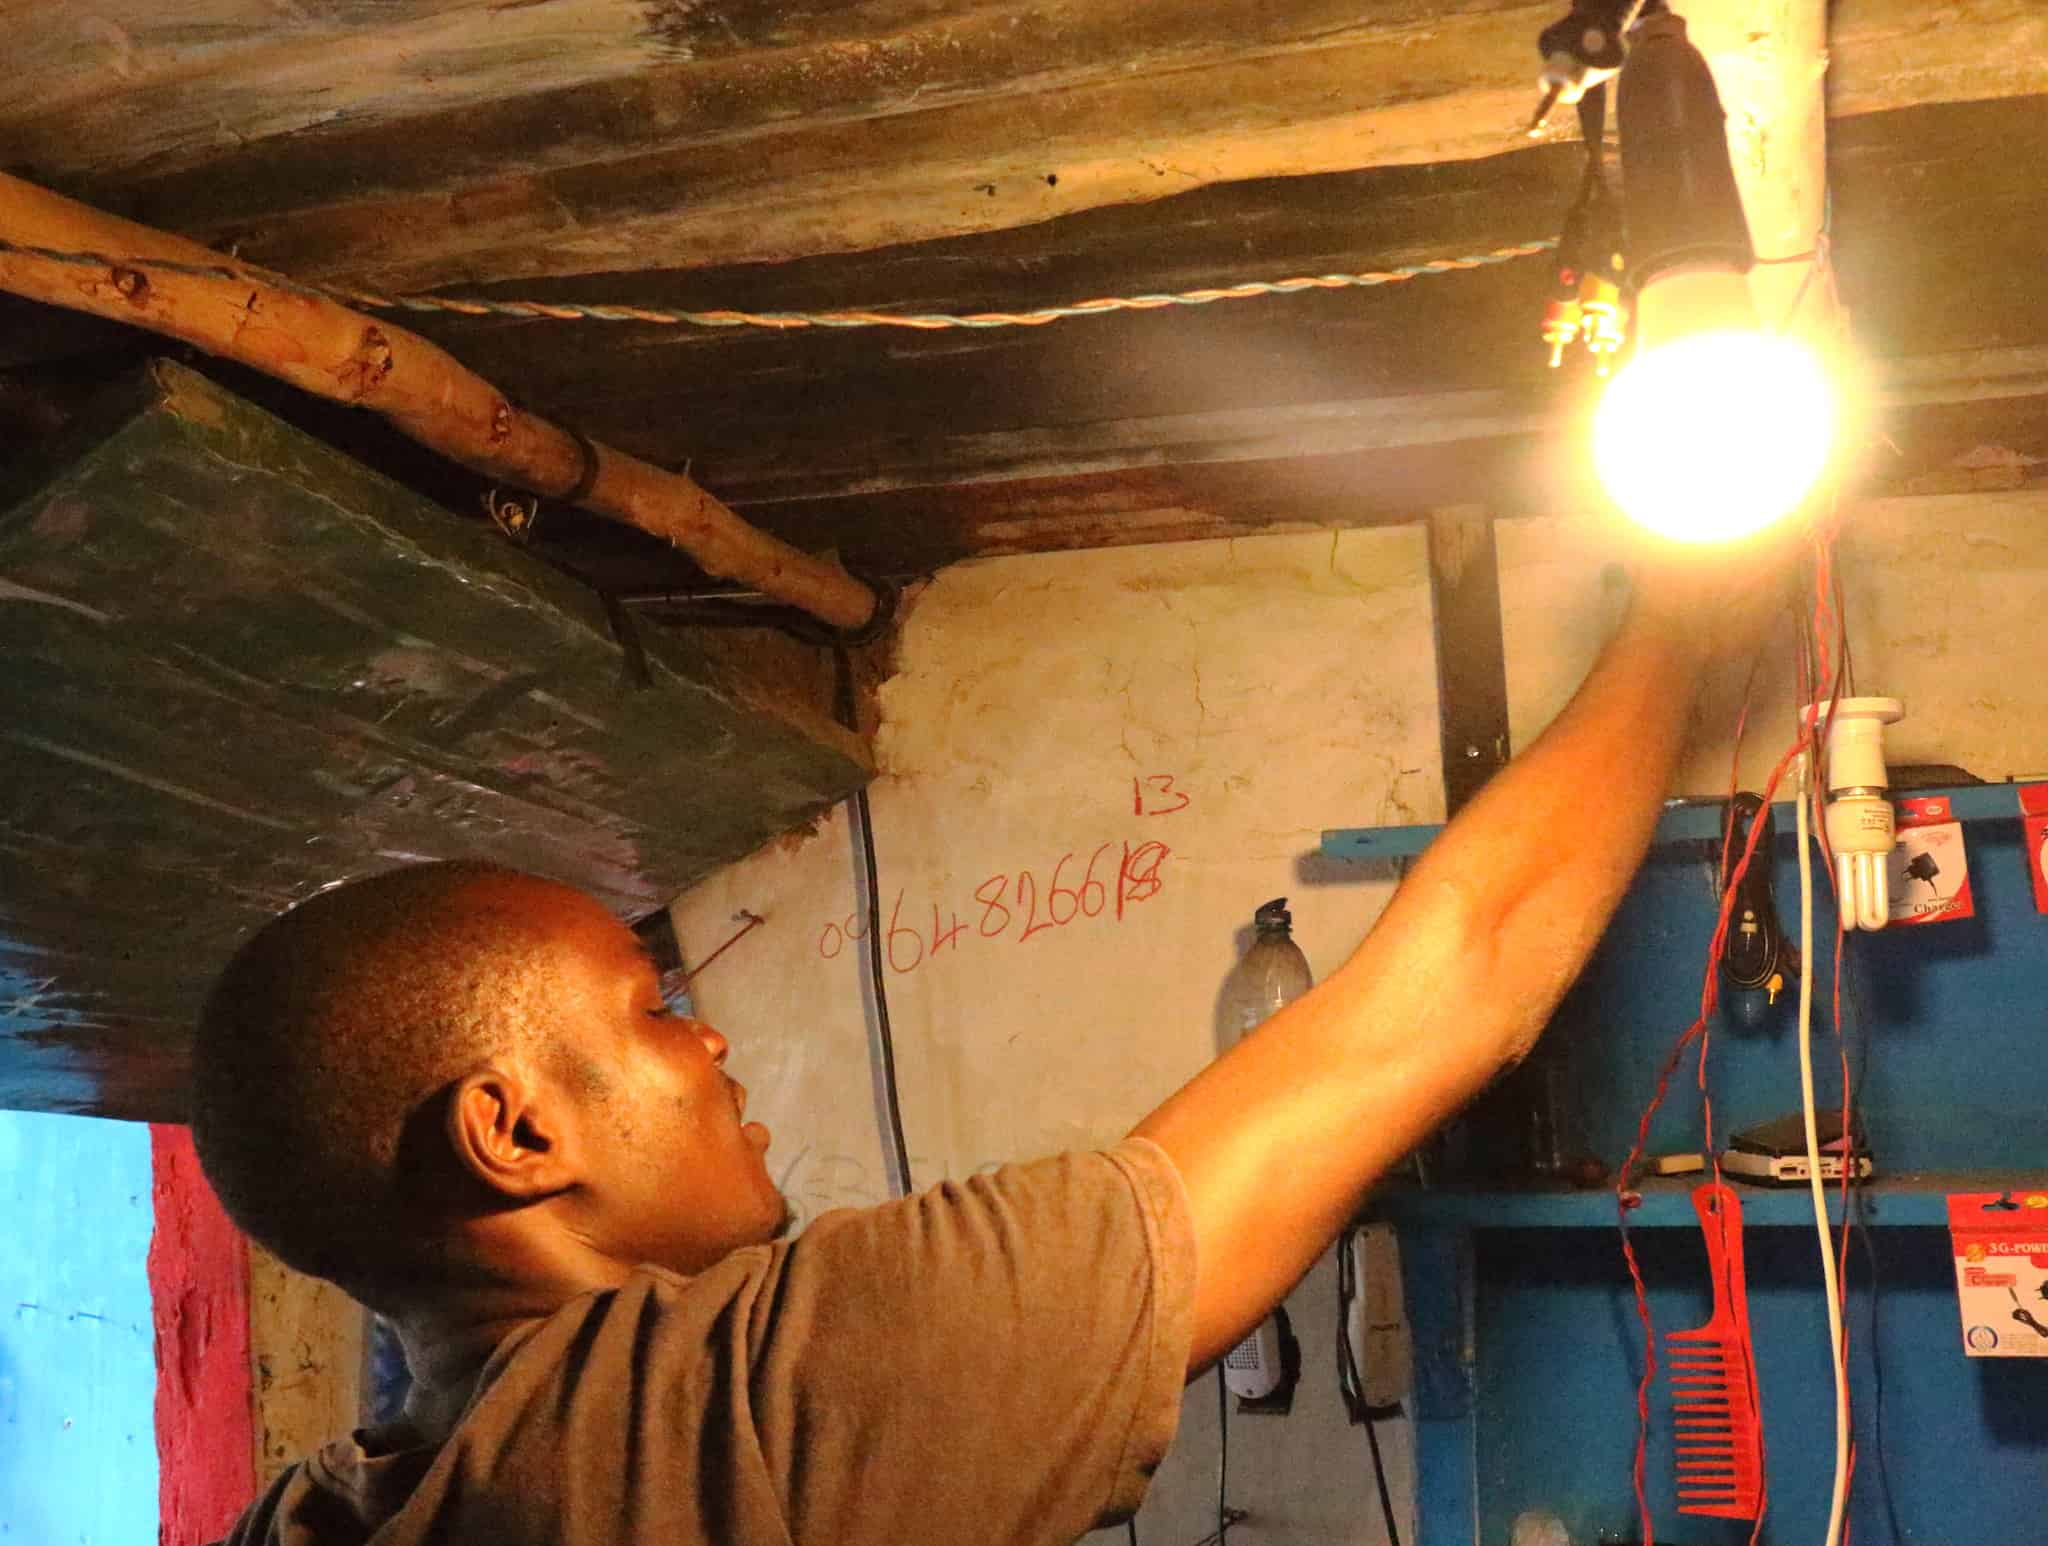 A man adjusts a lightbulb